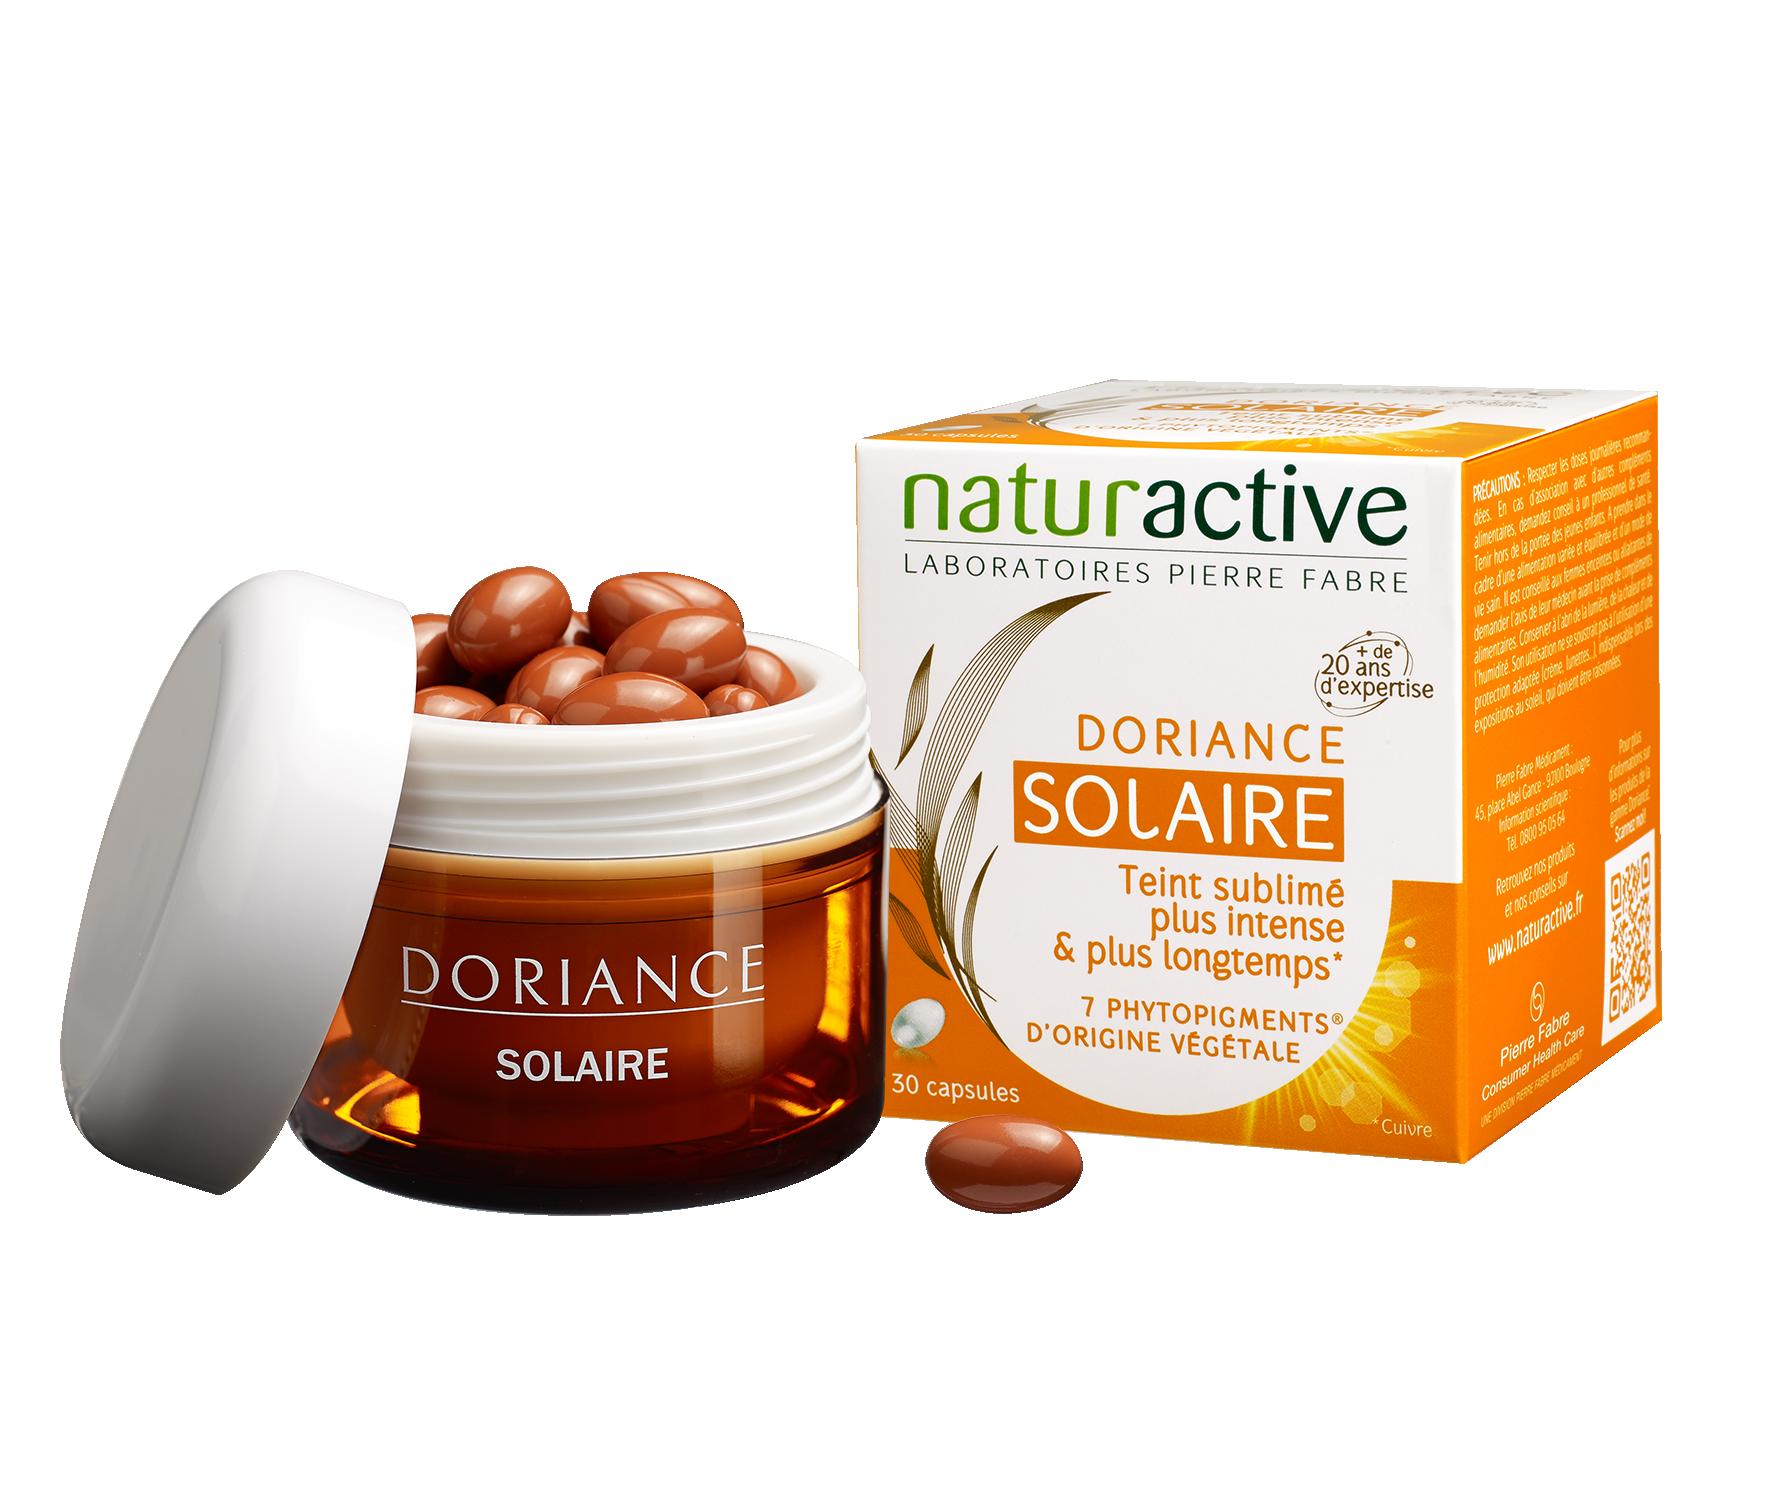 Doriance Solaire & Antiage